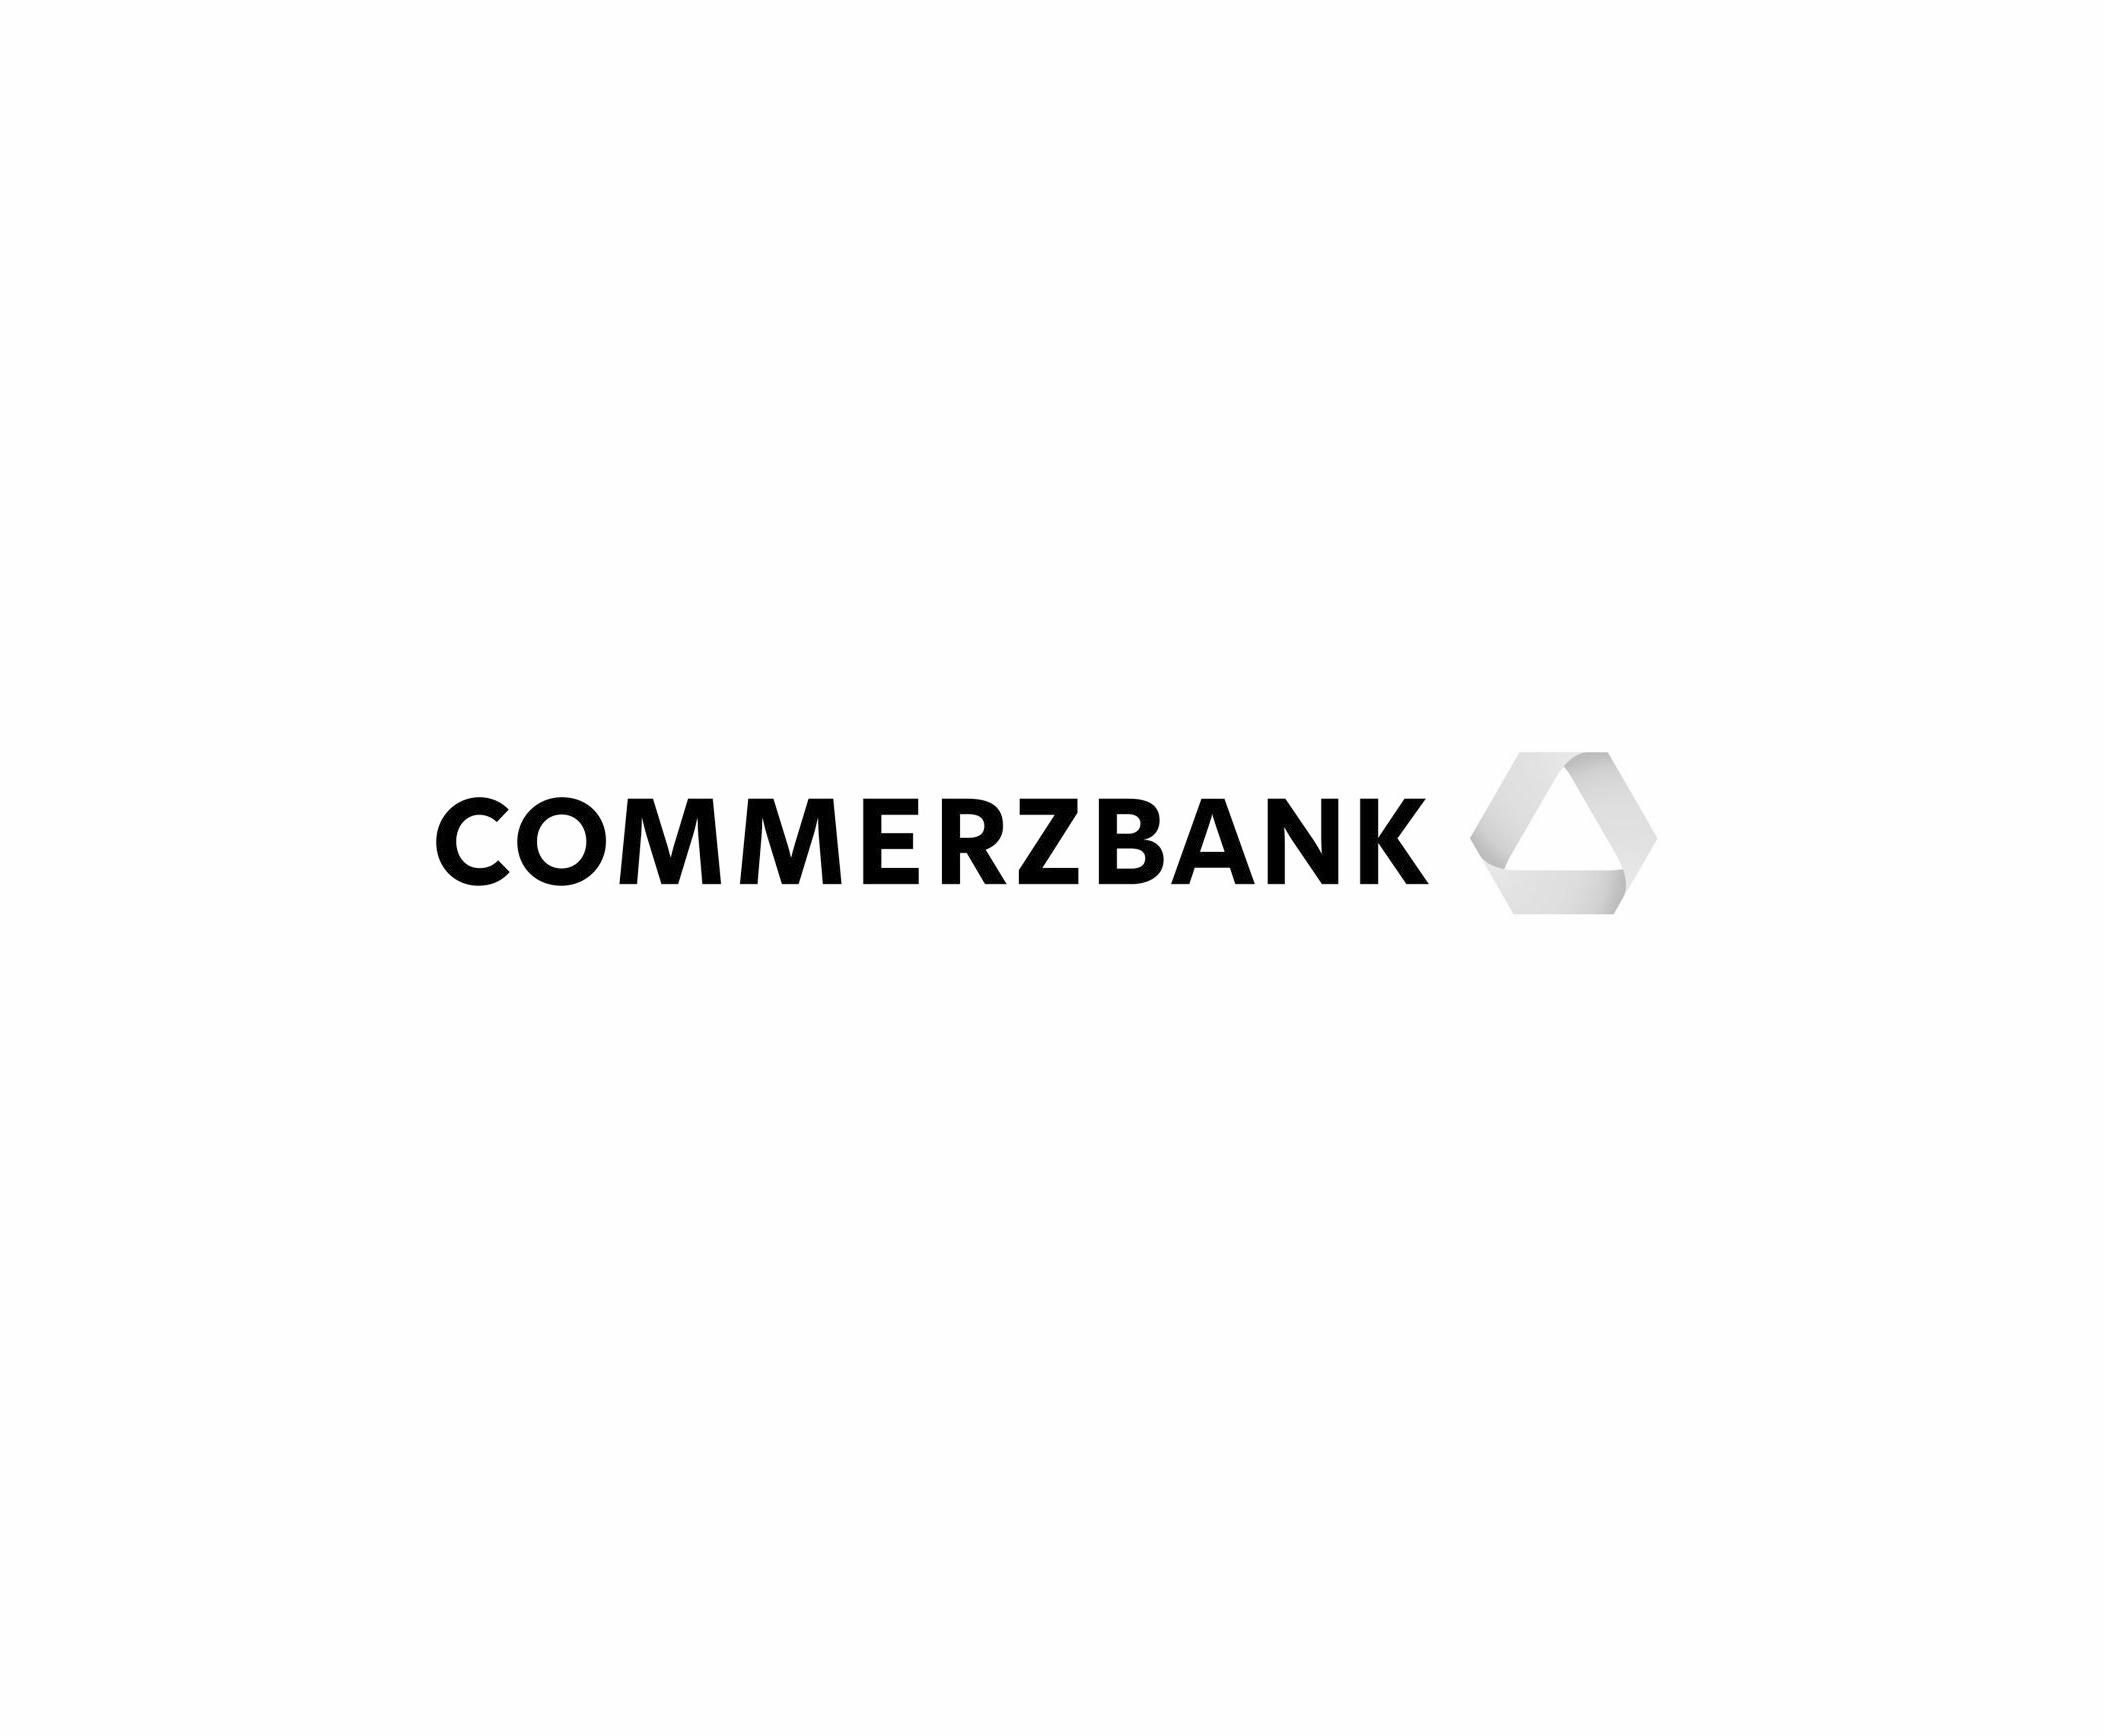 commerzbank-logo_edited